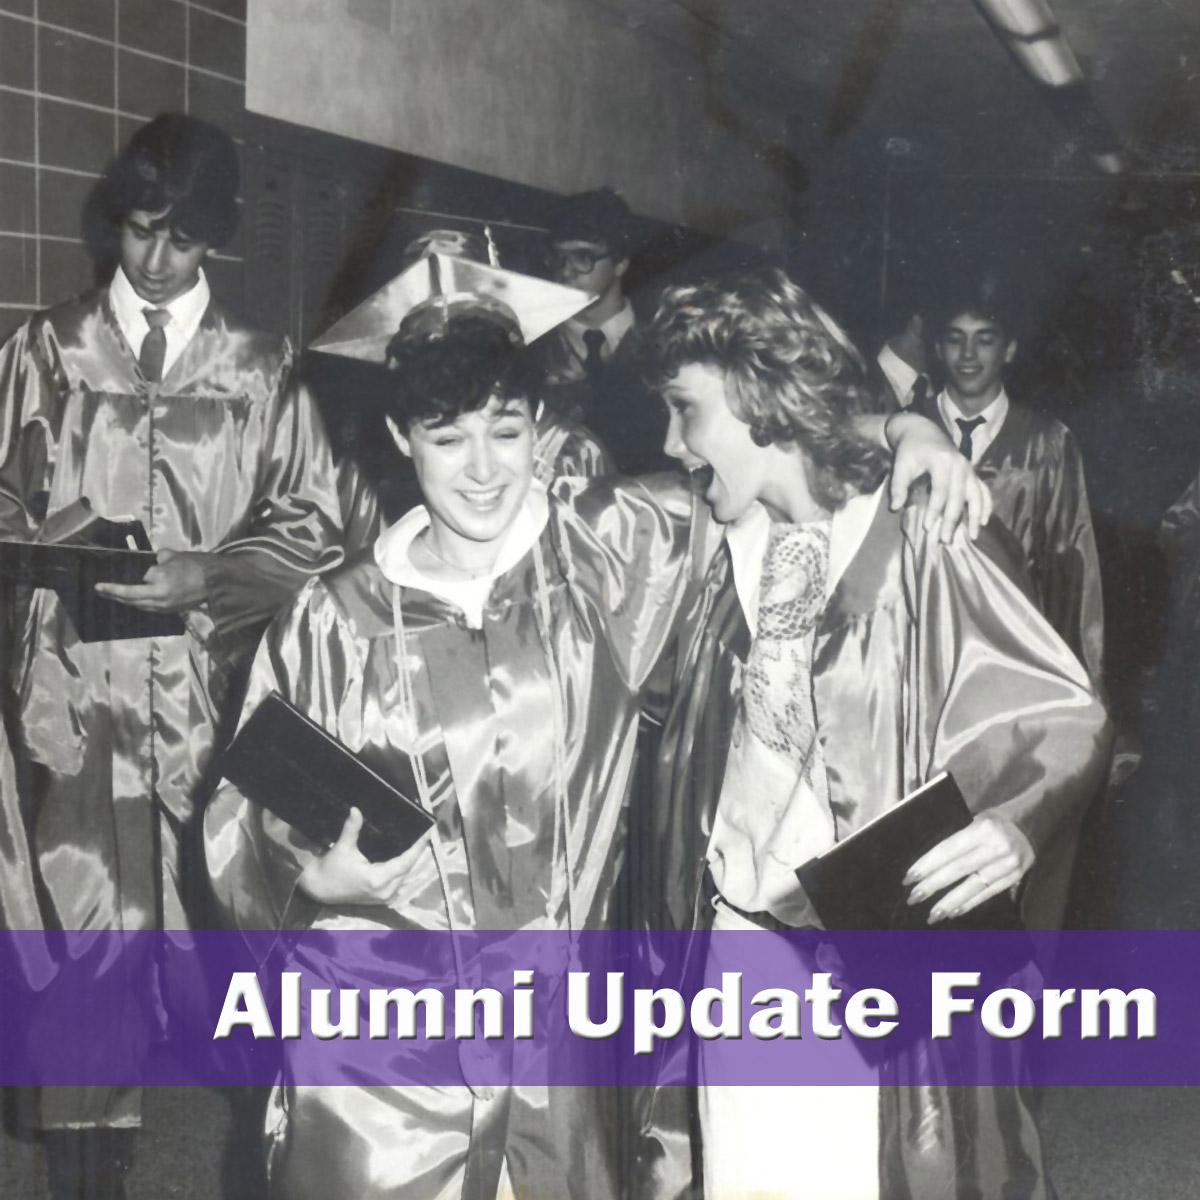 Alumni Update Form.jpg